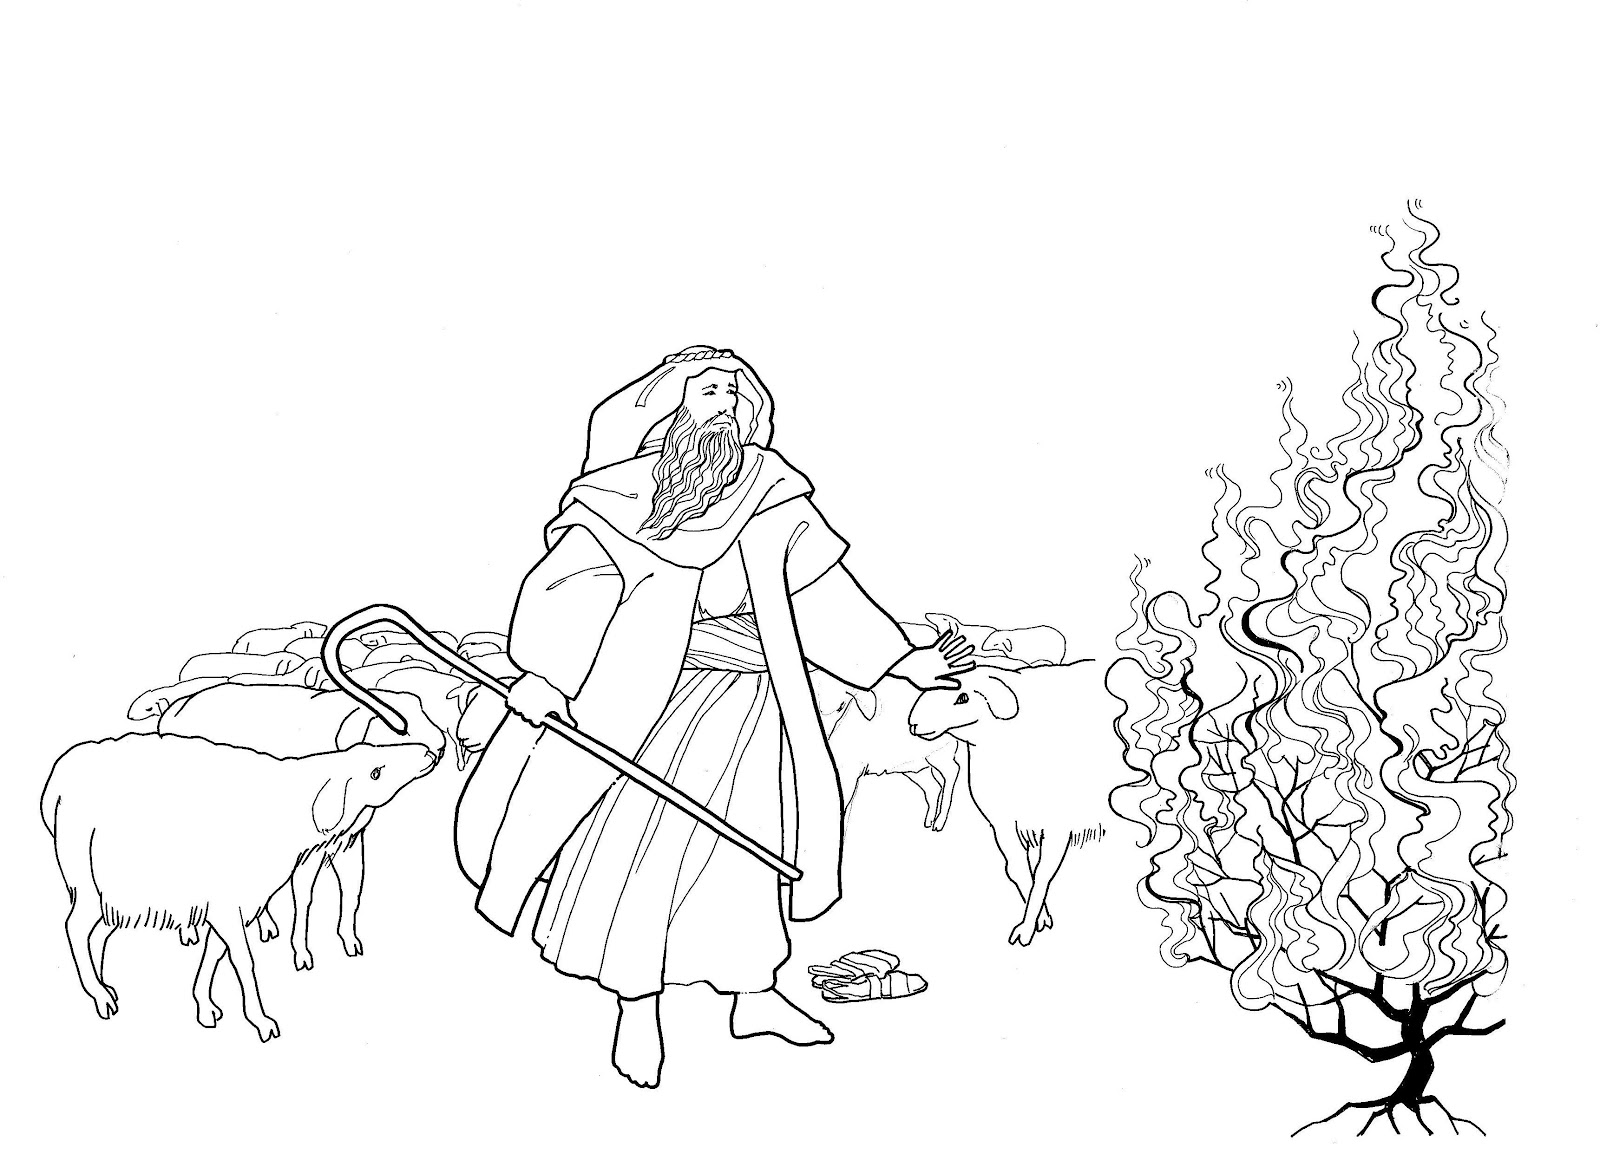 Make a joyful color: Moses and the Burning Bush